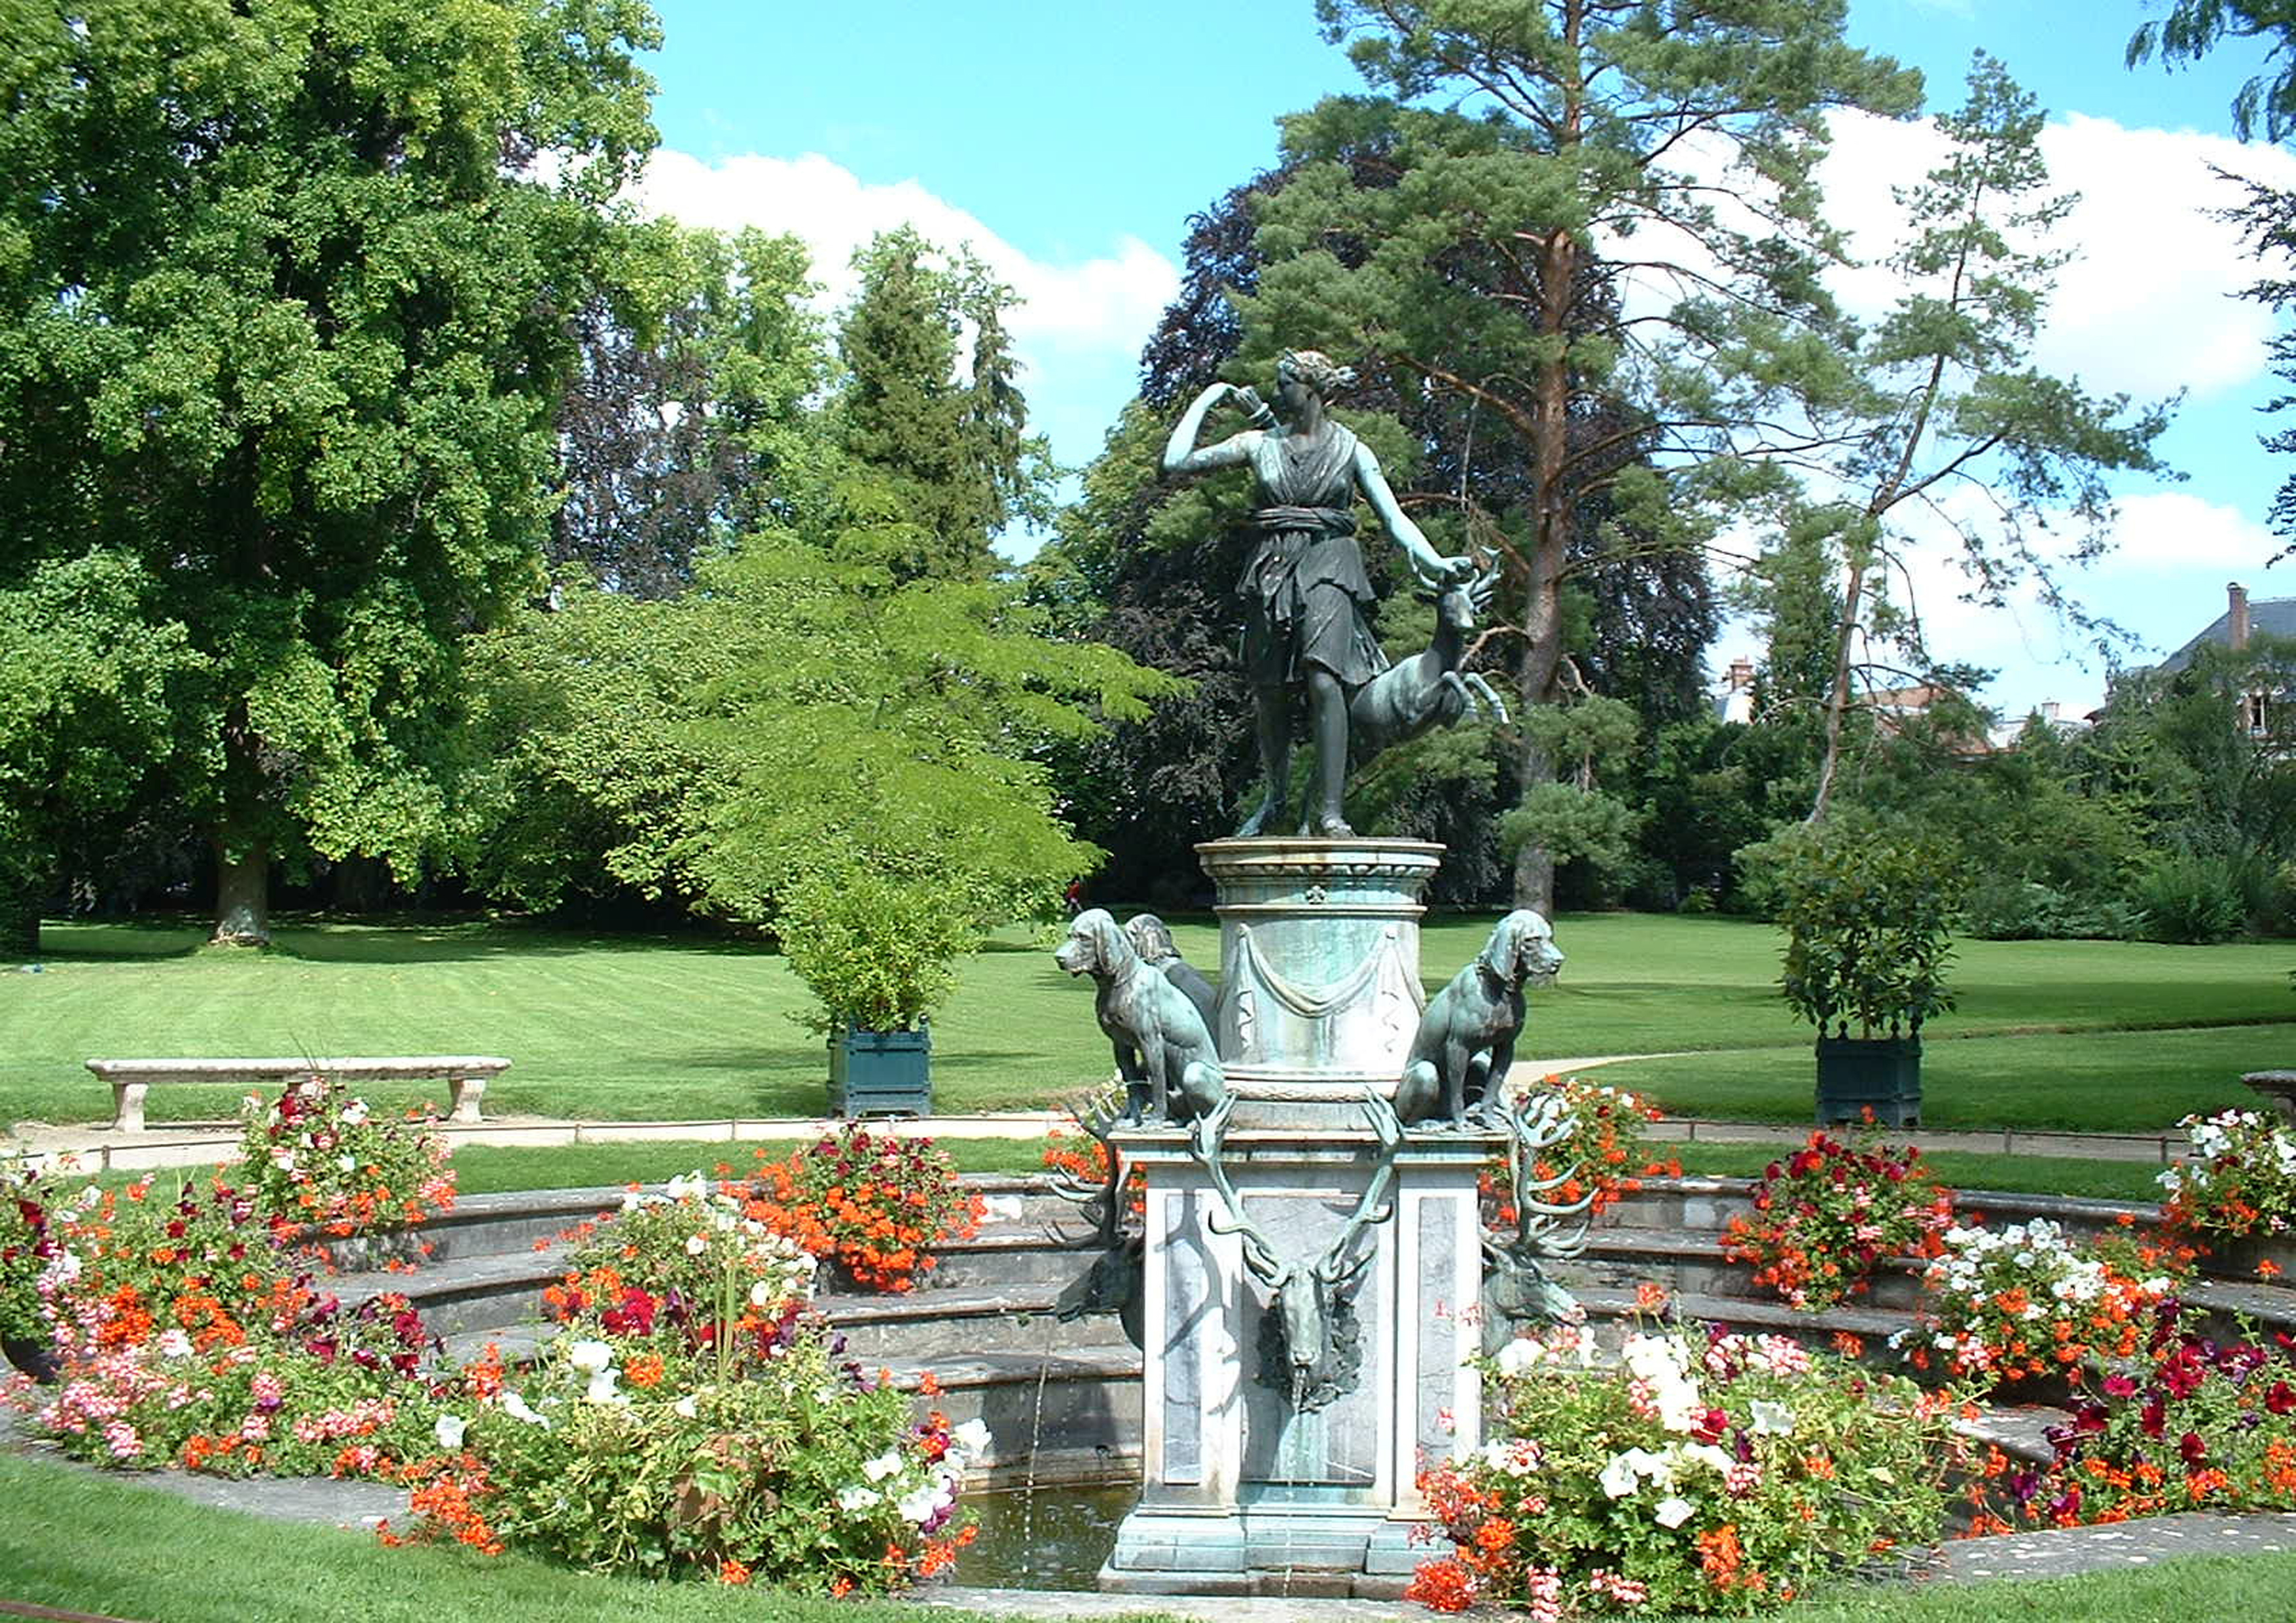 Jardins fleuris visiter blog de fontainebleau for Jardin anglais chateau fontainebleau